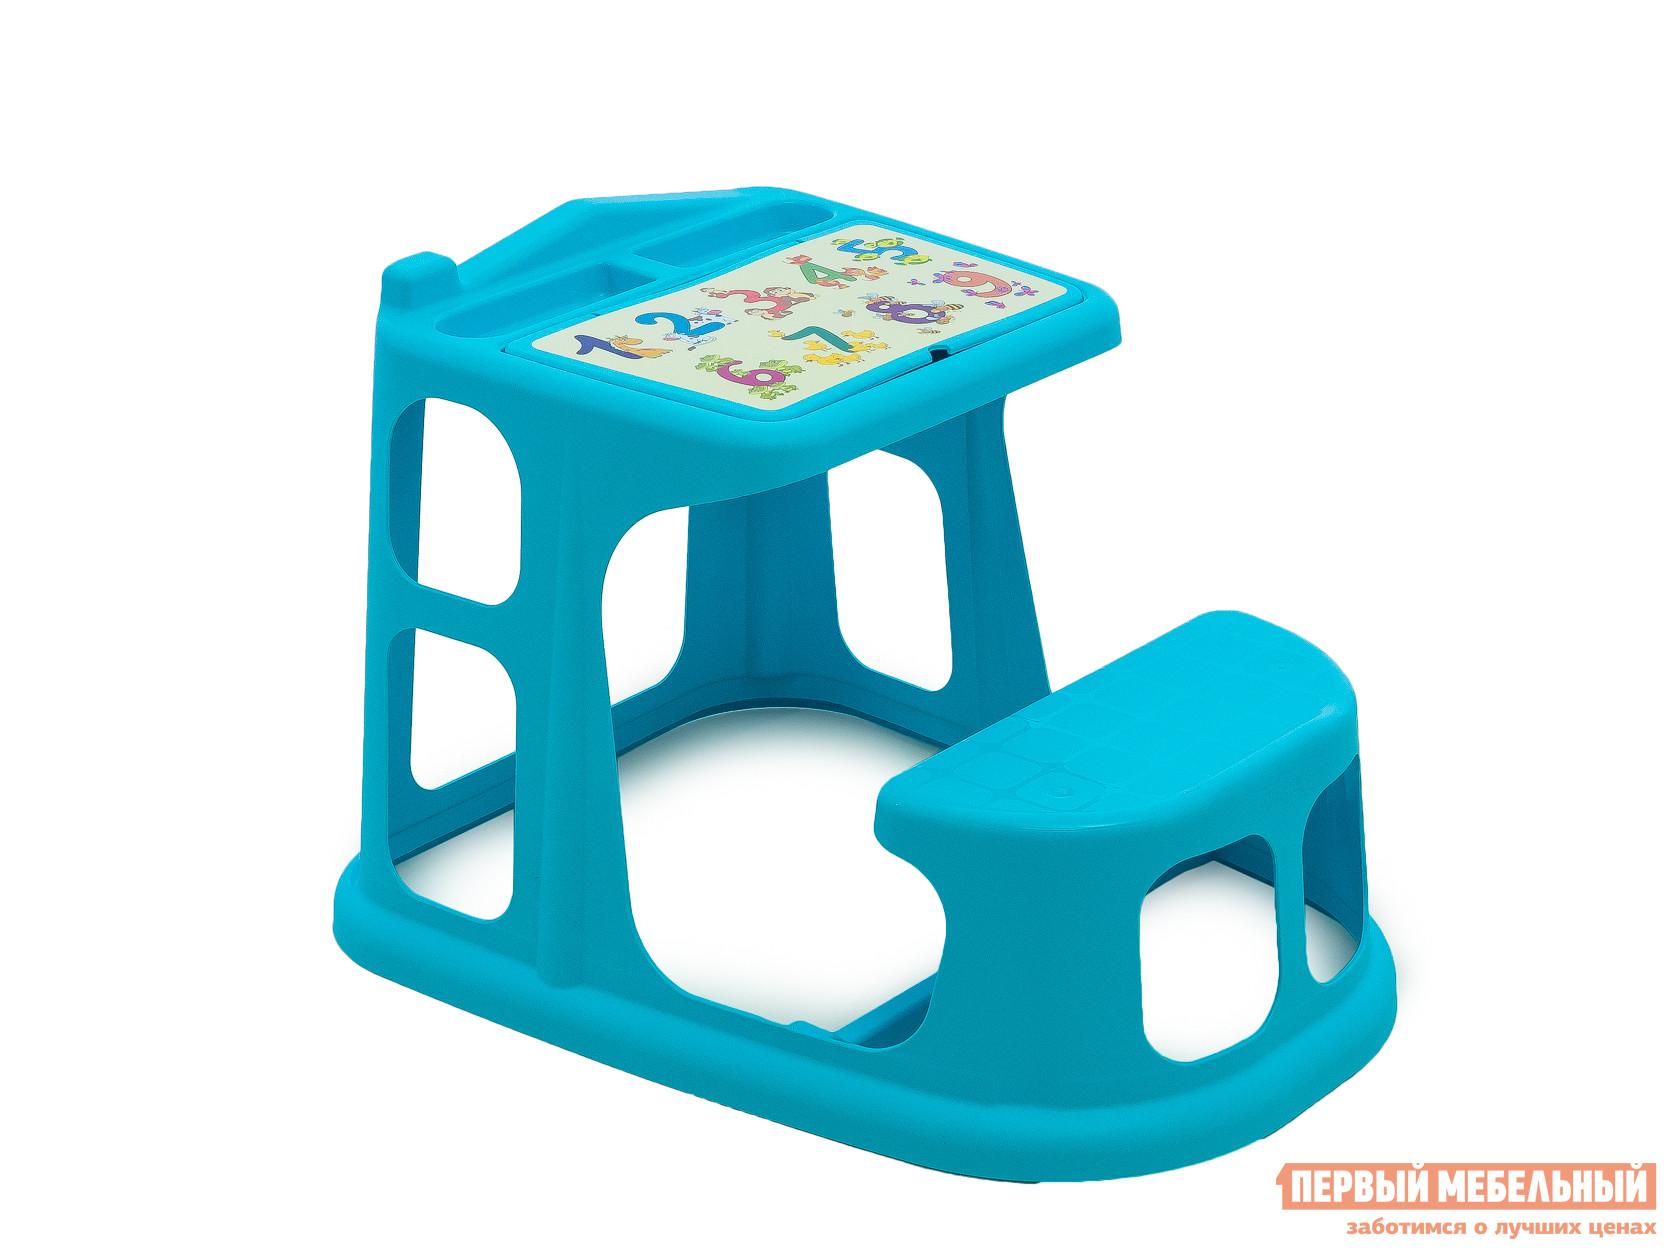 Парта Пластишка 431377102 Голубой